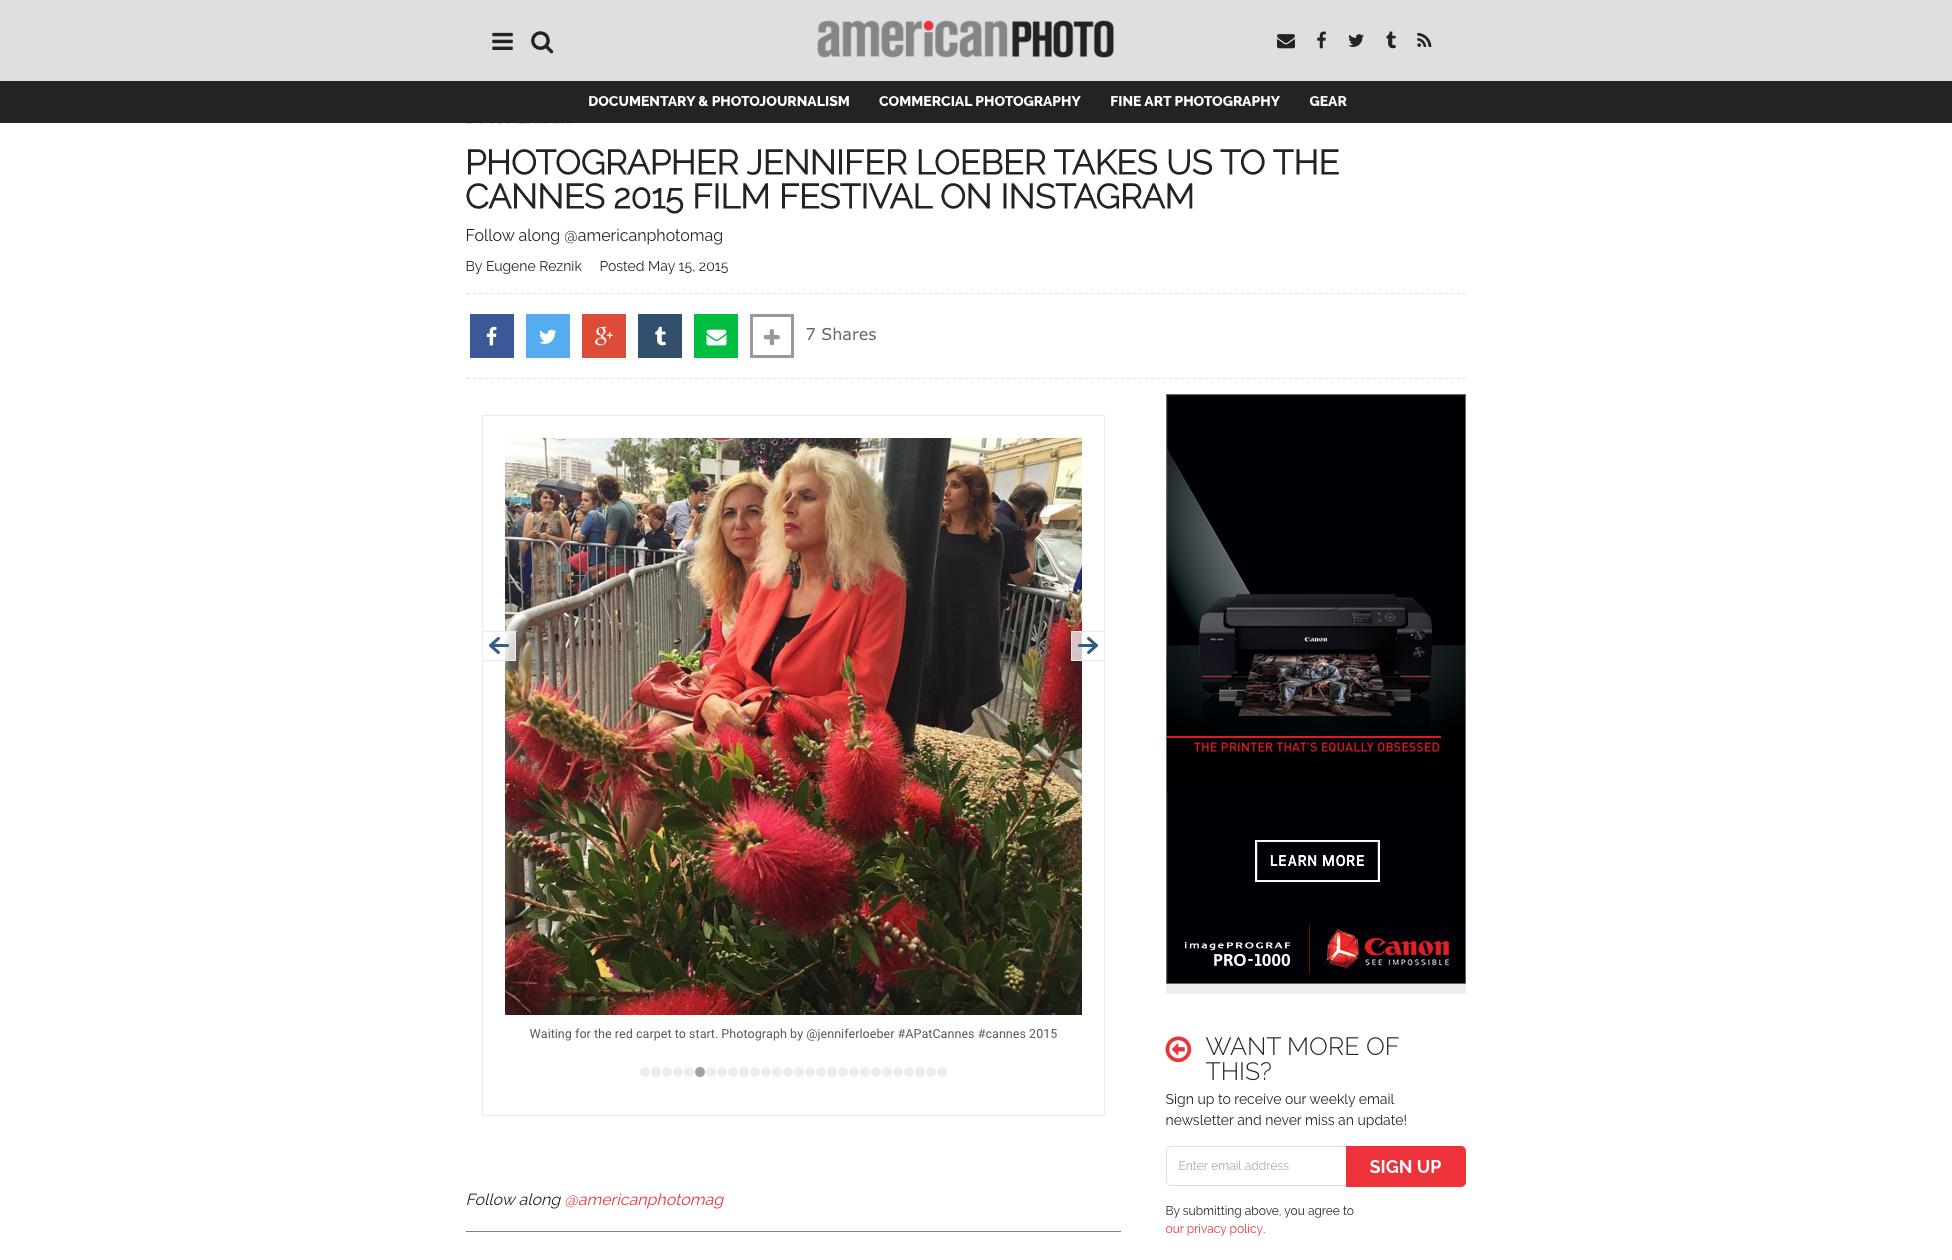 American Photo Magazine, May 2015